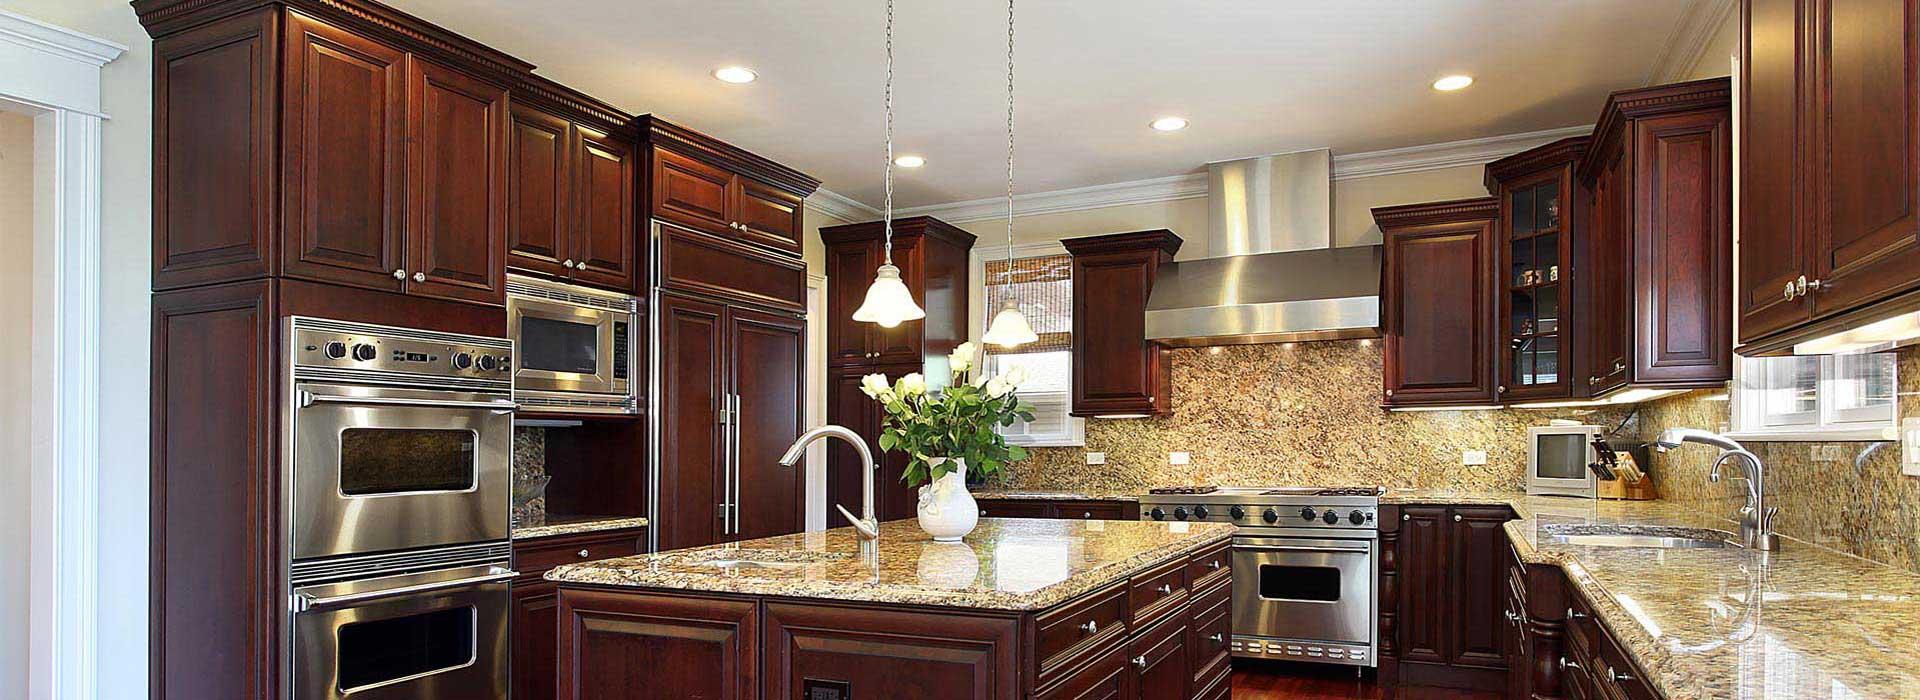 Best Kitchen Gallery: Look Kitchen Cabi Refacing of Refaced Kitchen Cabinets on rachelxblog.com